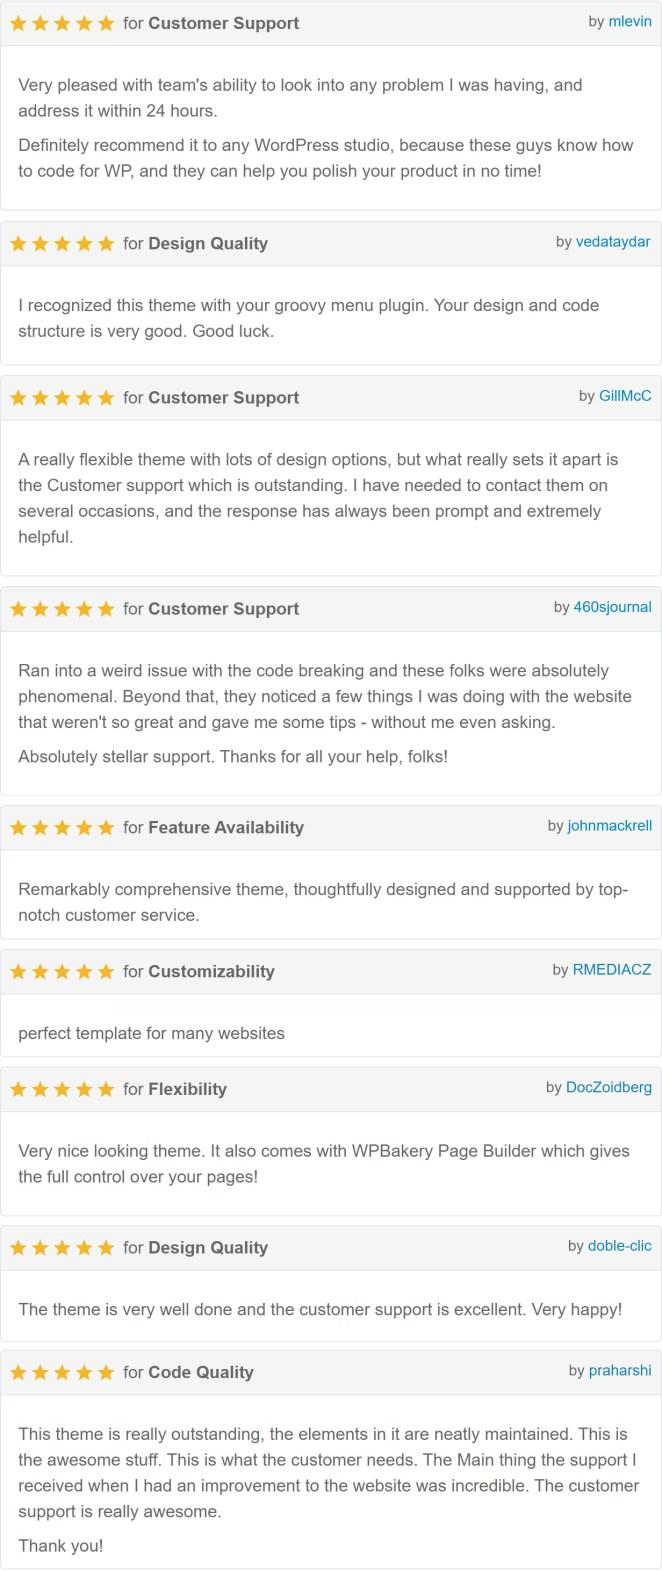 Customers Testimonials for our multipurpose wordpress theme